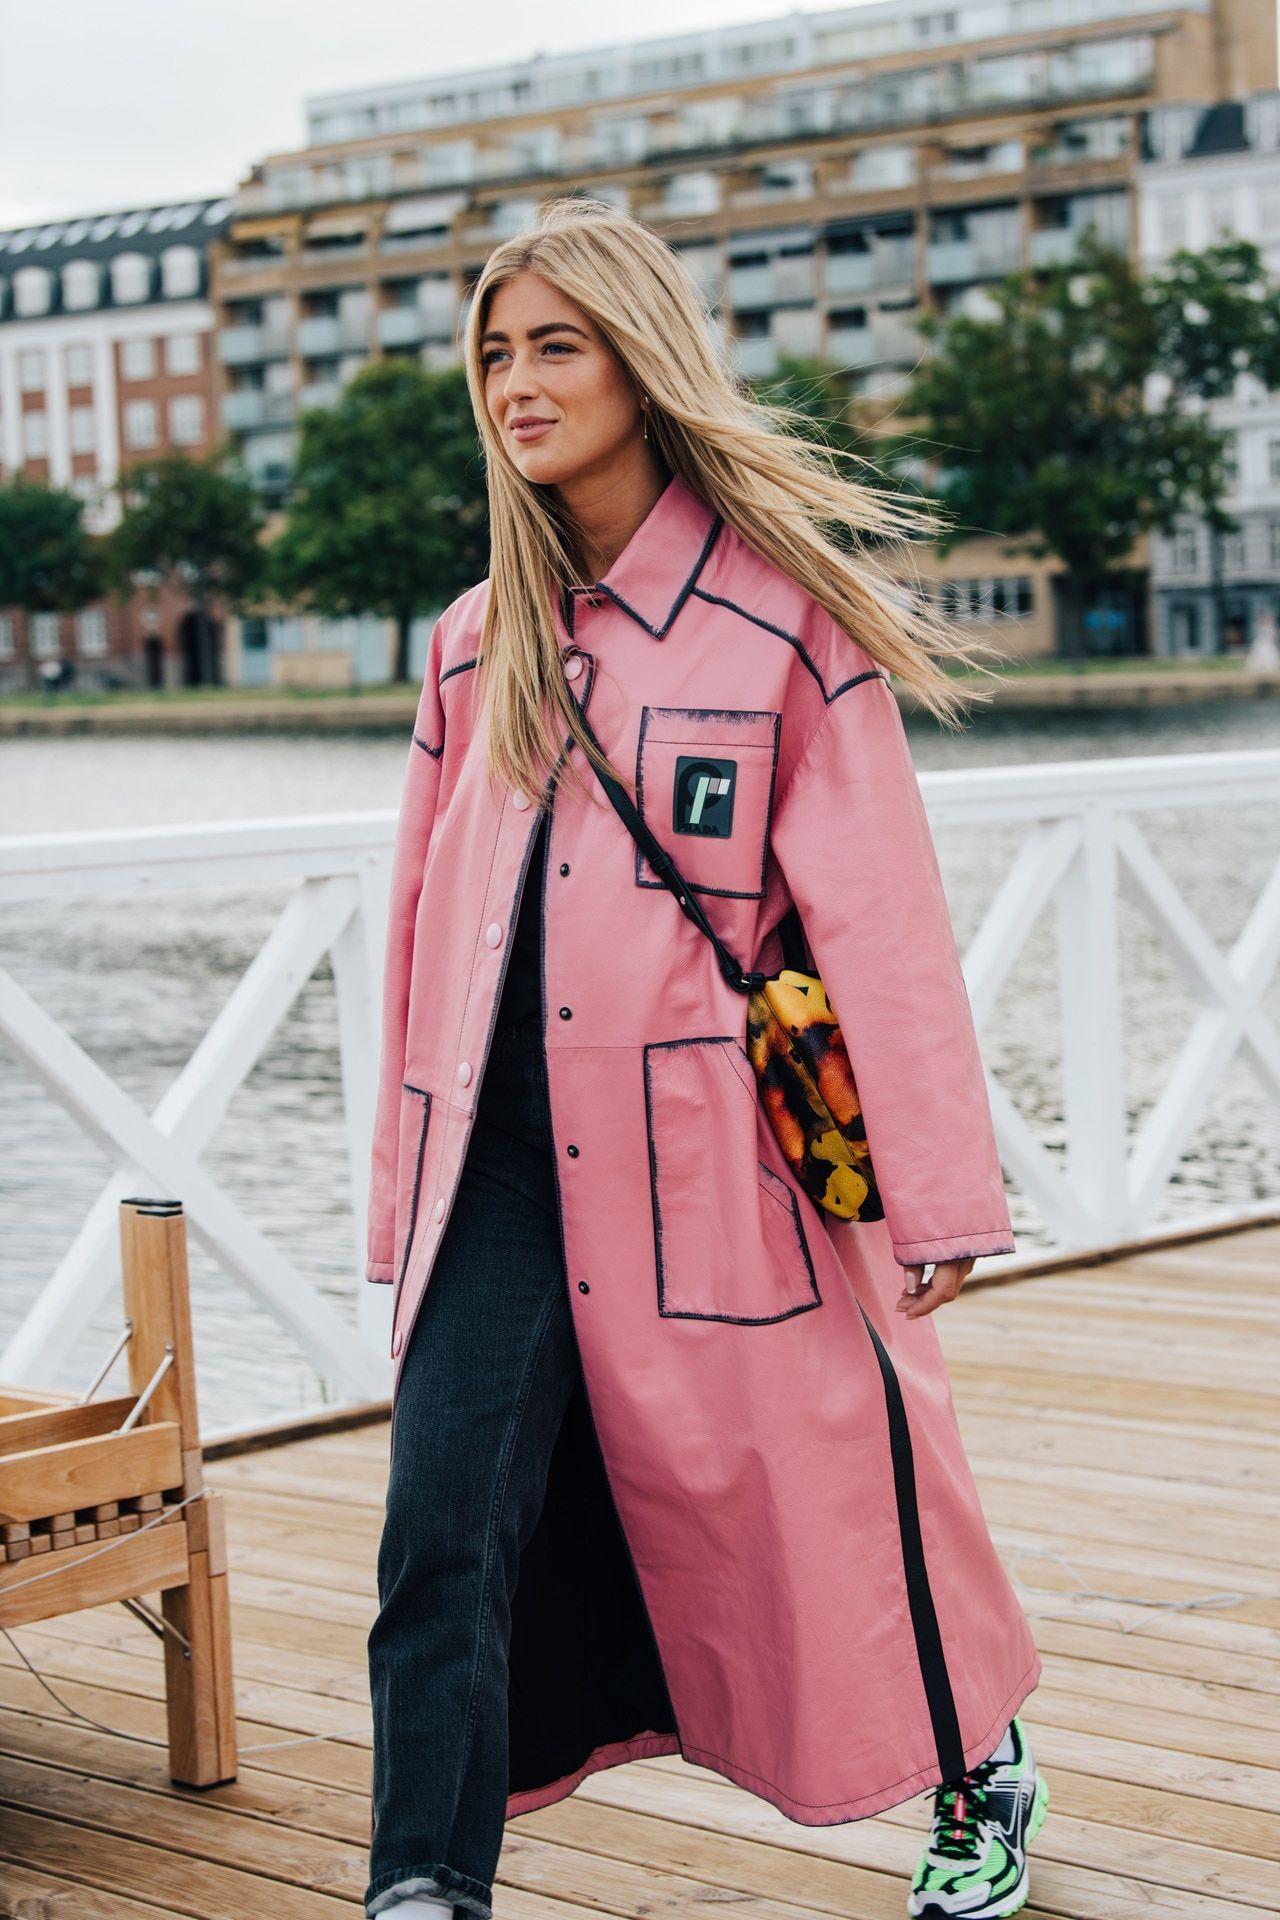 Street style inspiration from Copenhagen Fashion Week spring/summer 2020